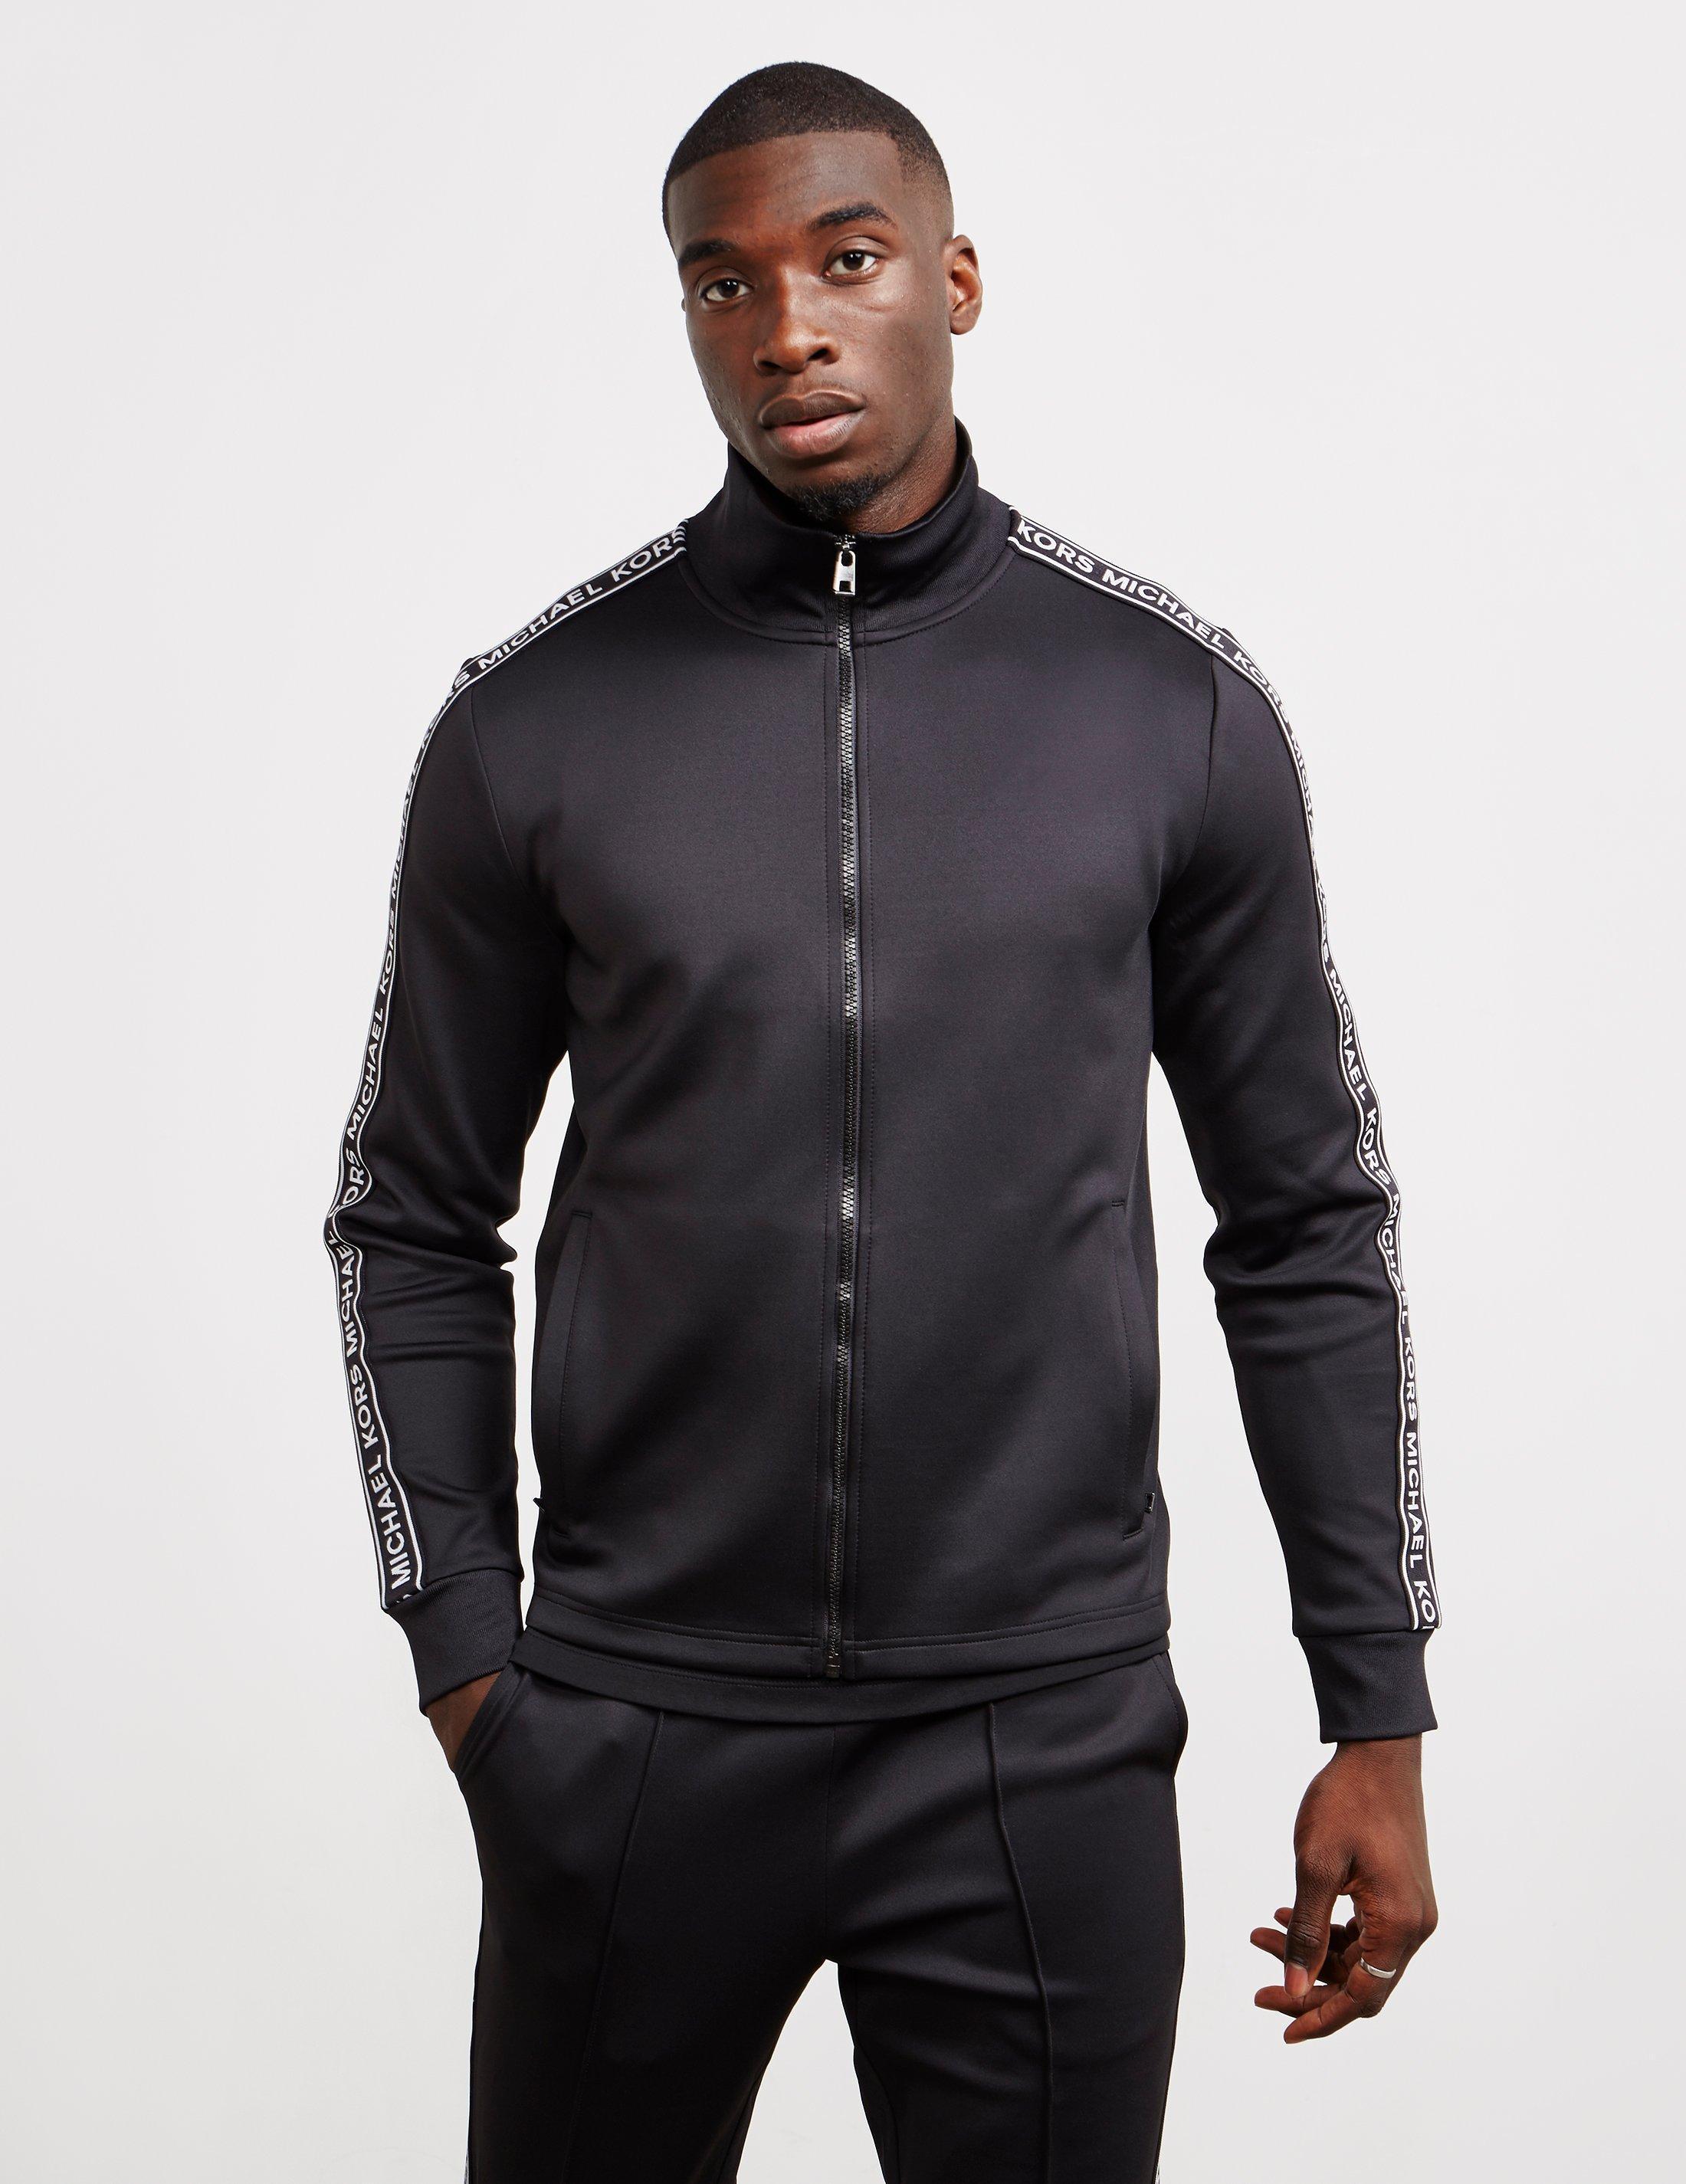 96b53d1f327f1 Lyst - Michael Kors Tape Track Top Black in Black for Men